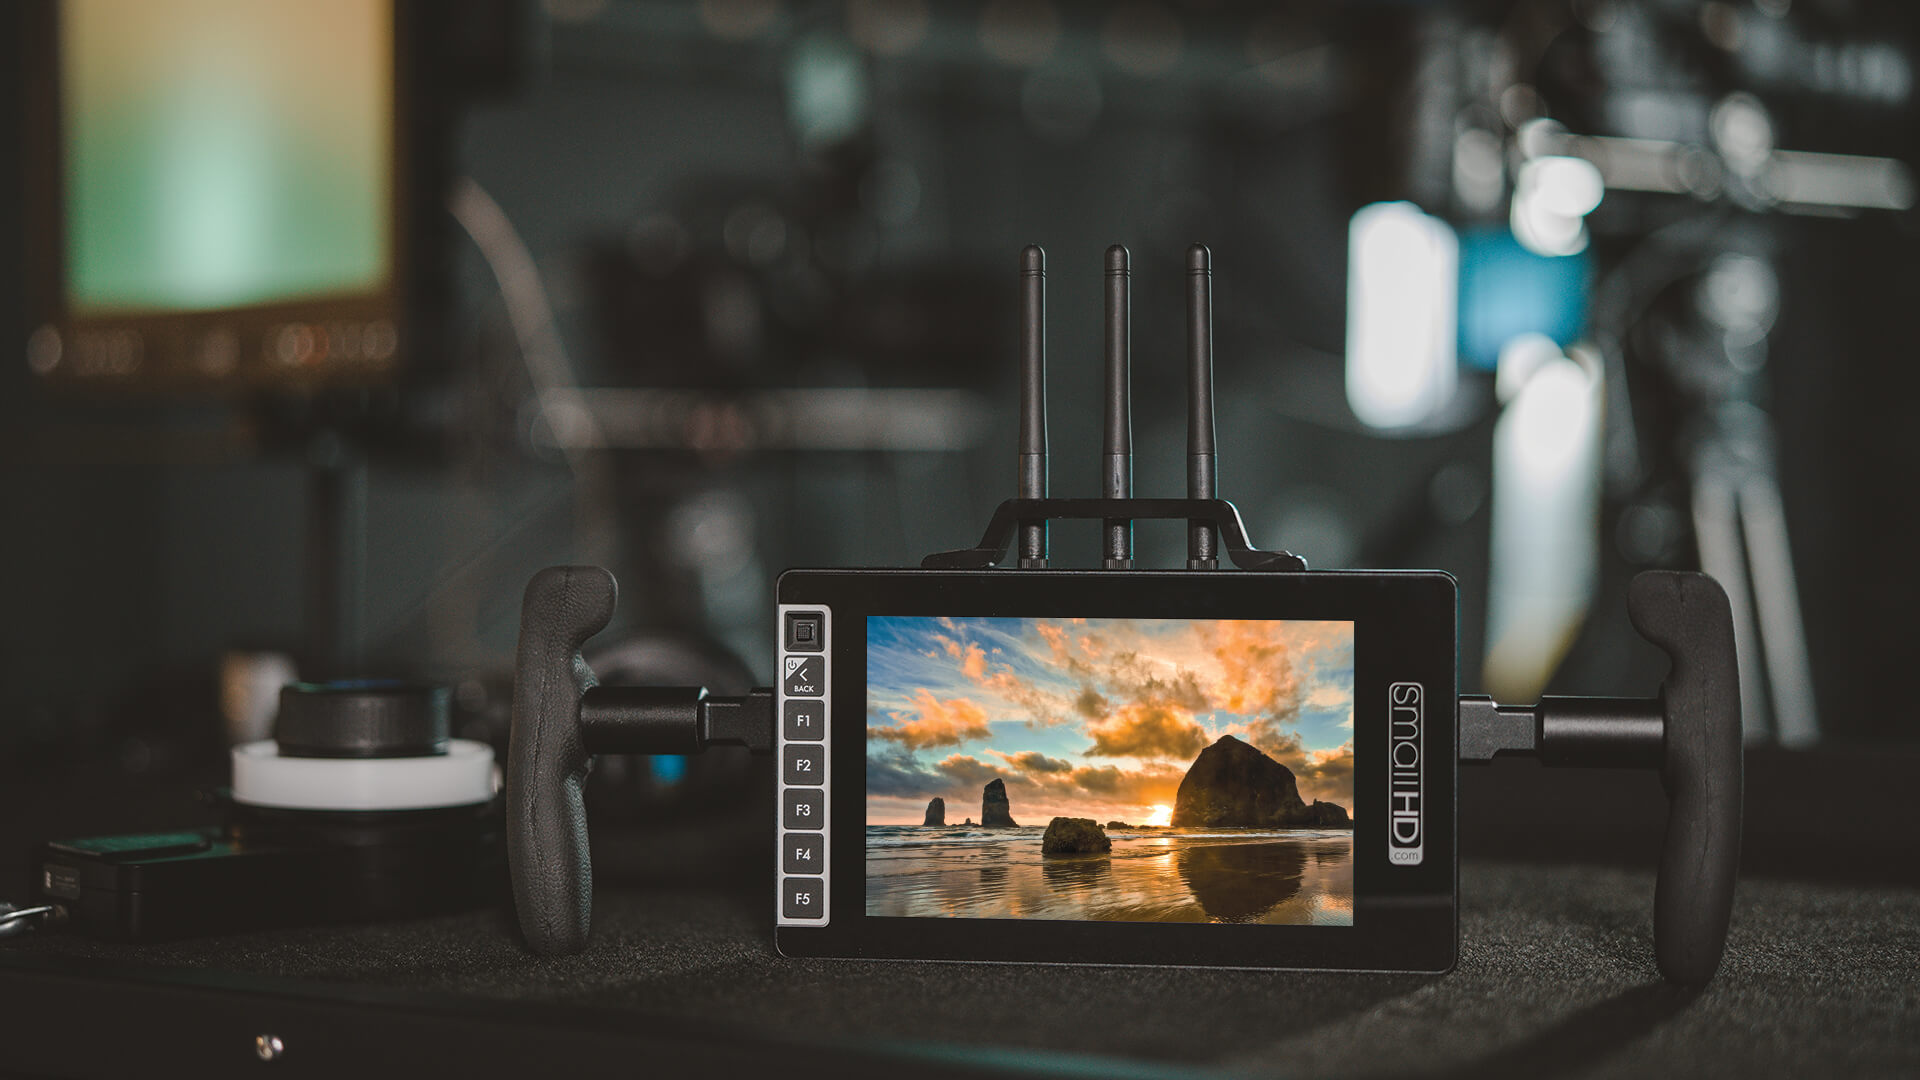 Read SmallHD & Teradek Collaborate to Launch 703 Bolt Wireless Director's Monitor